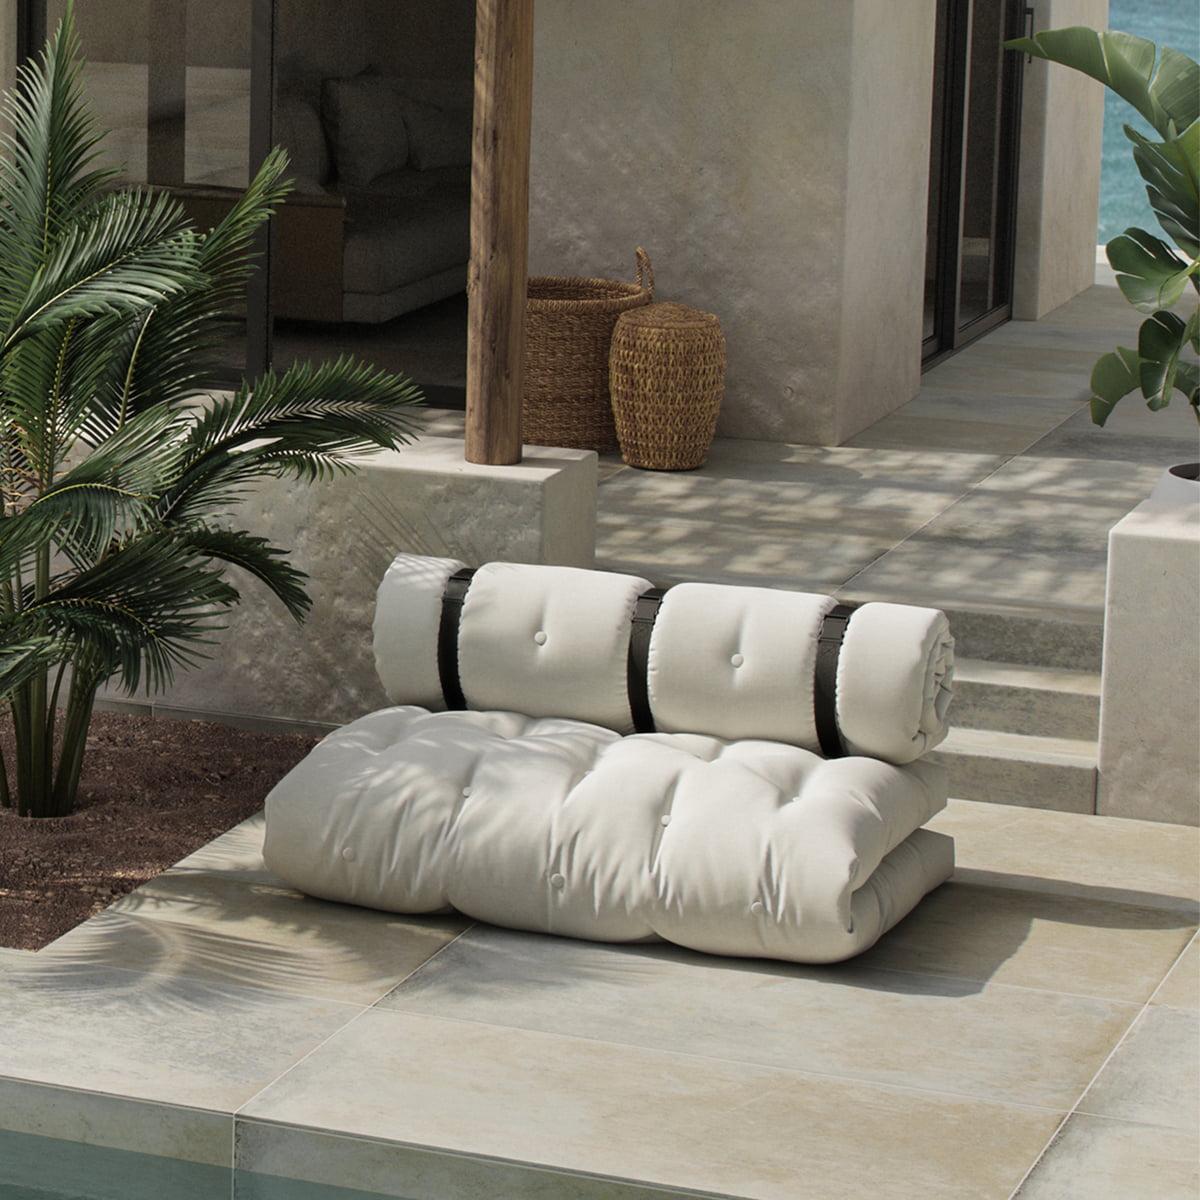 Design Bank Wit.Karup Design Gesp Out Sofa Out Gesp Omhoog Connox